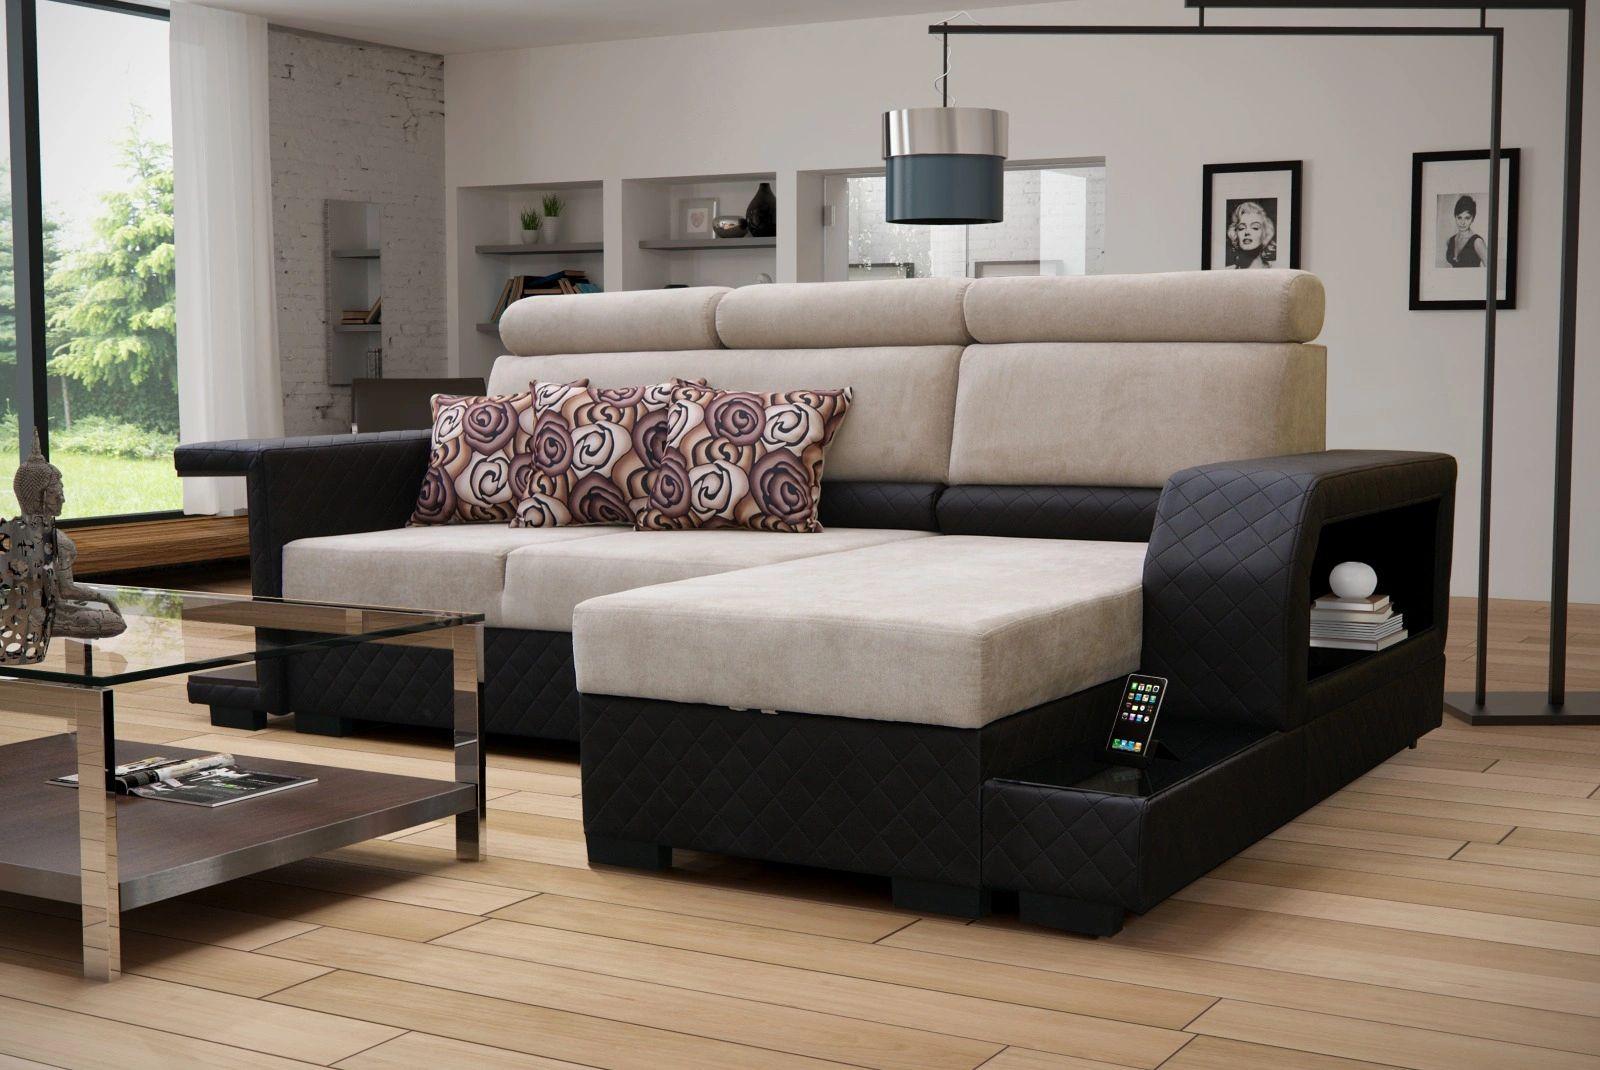 Amaro Beige Sectional Sofa by Skyler Designs